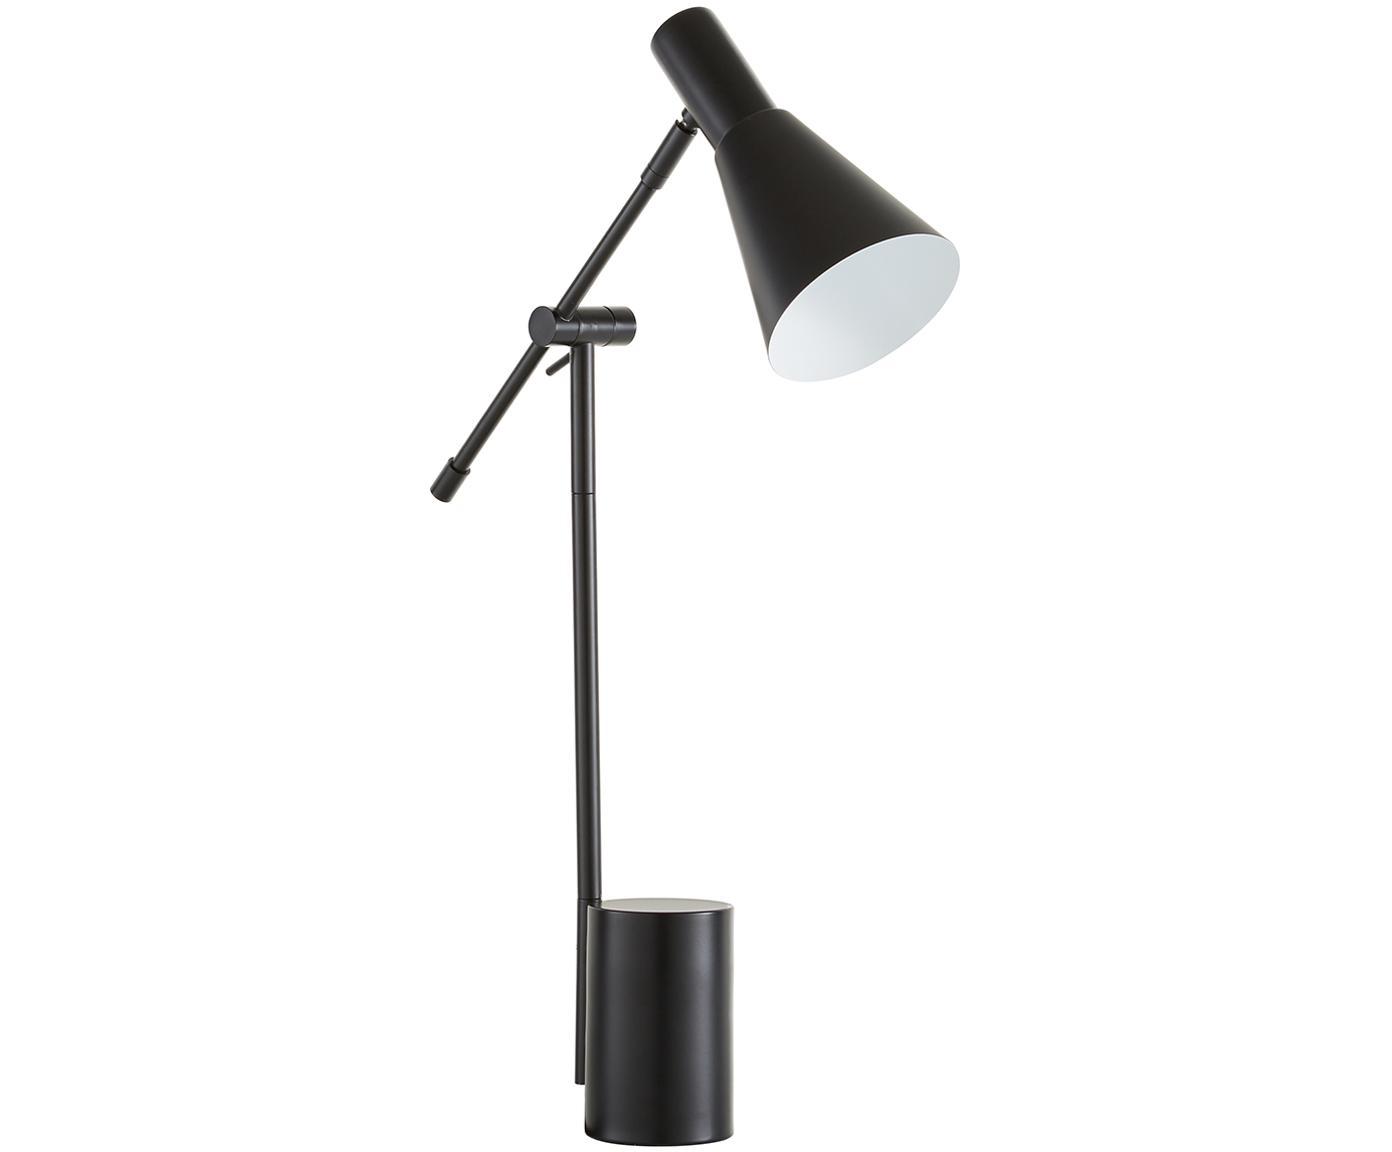 Lámpara de mesa Sia, Pantalla: metal con pintura en polv, Cable: cubierto en tela, Negro, An 13 x Al 63 cm